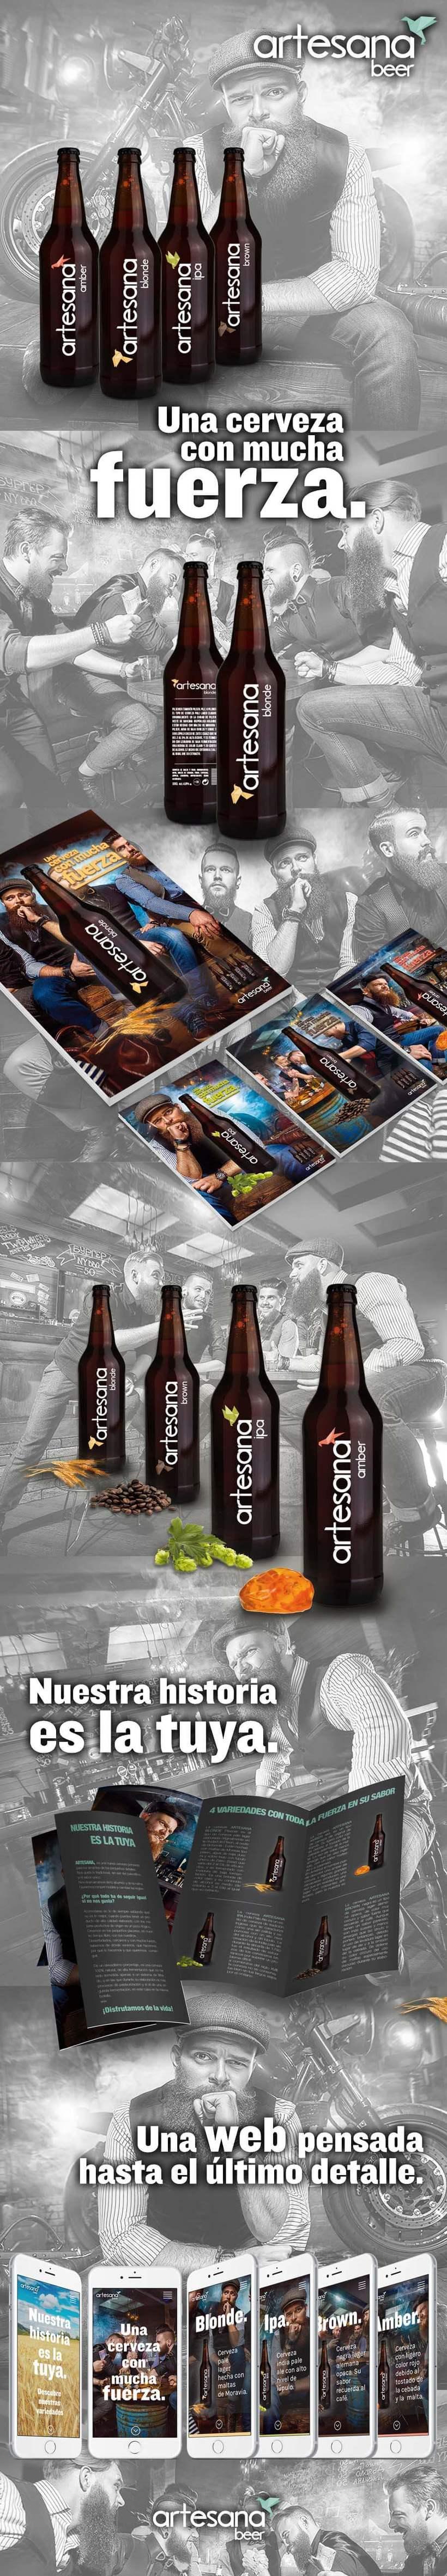 Proyecto360 Artesana :: Brand + pack + Editorial + web 1